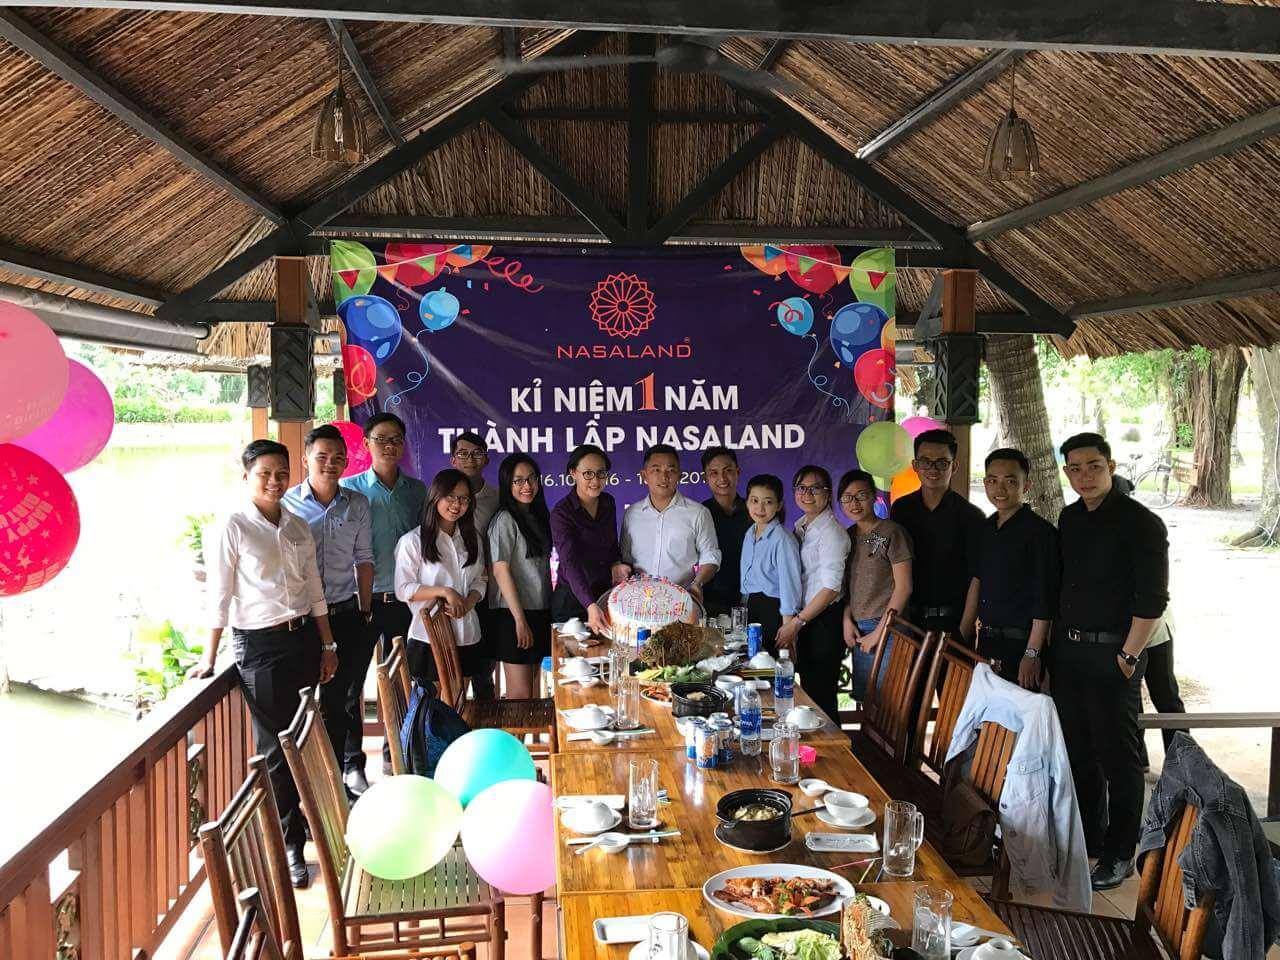 sinh nhật nasaland